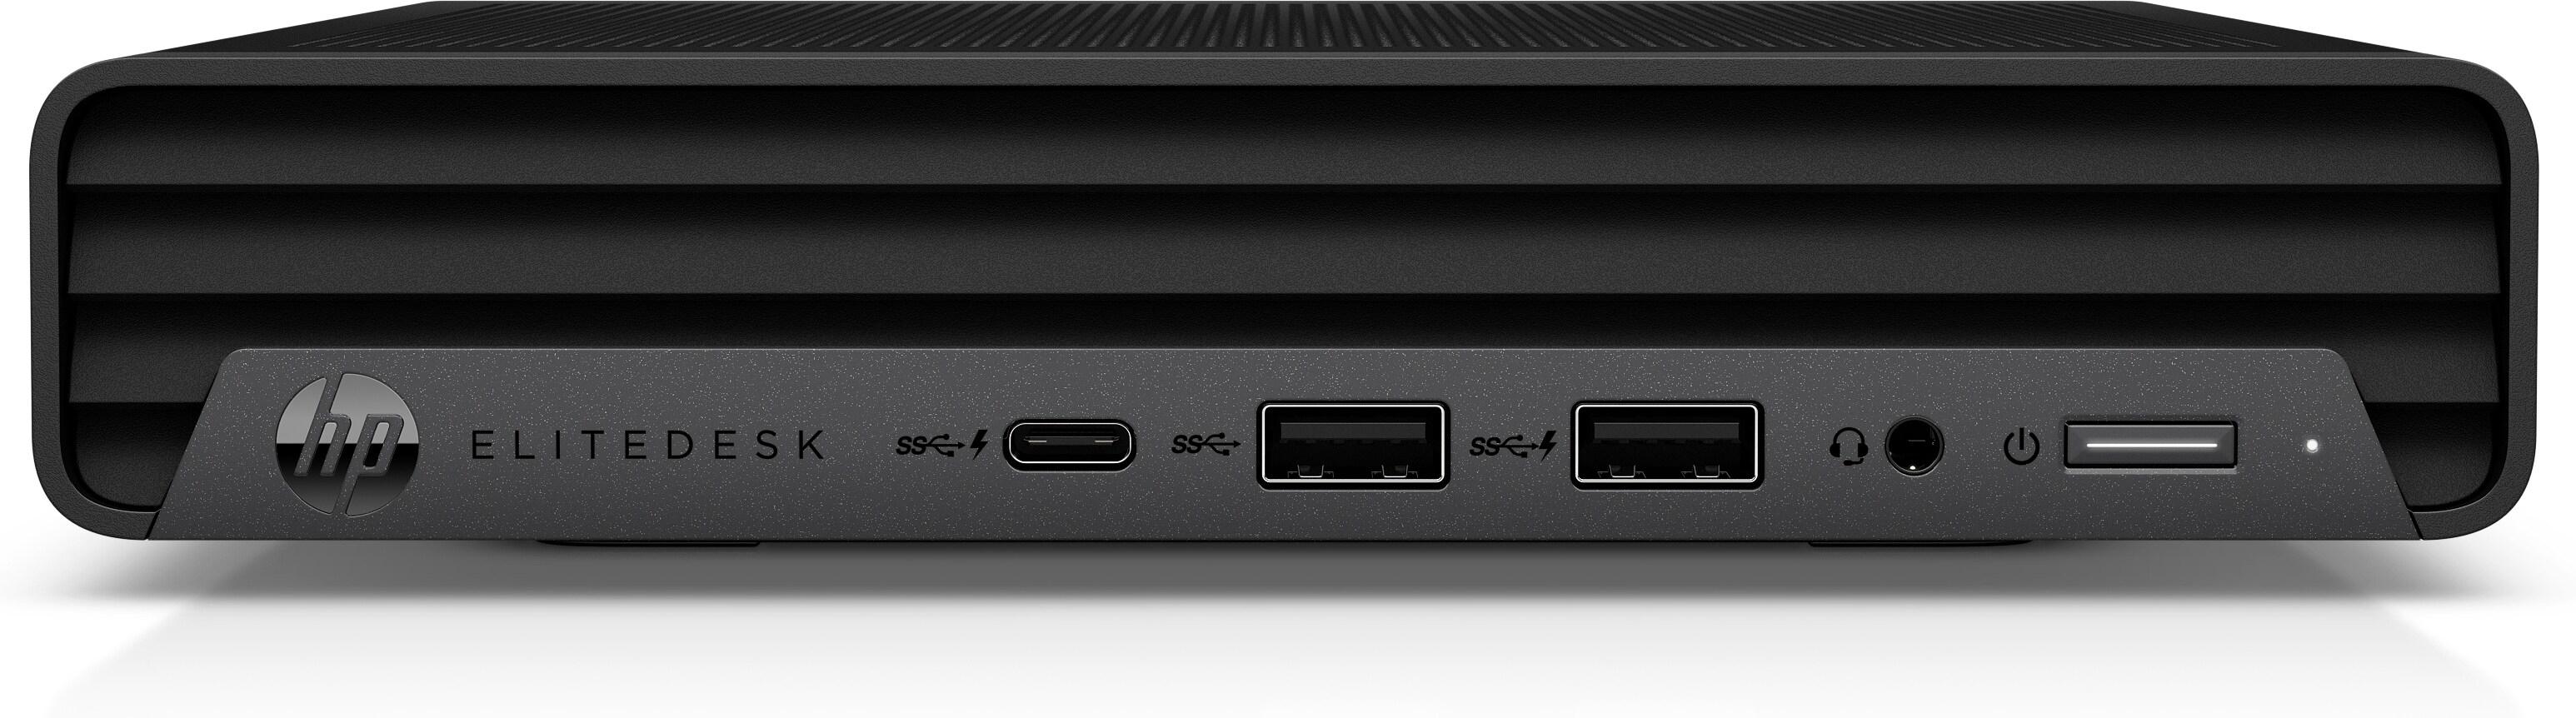 HP - HP - Mini PC EliteDesk 800G6 DM i5-10500, 8 GB, 256GB SSD, W10P6 64bits